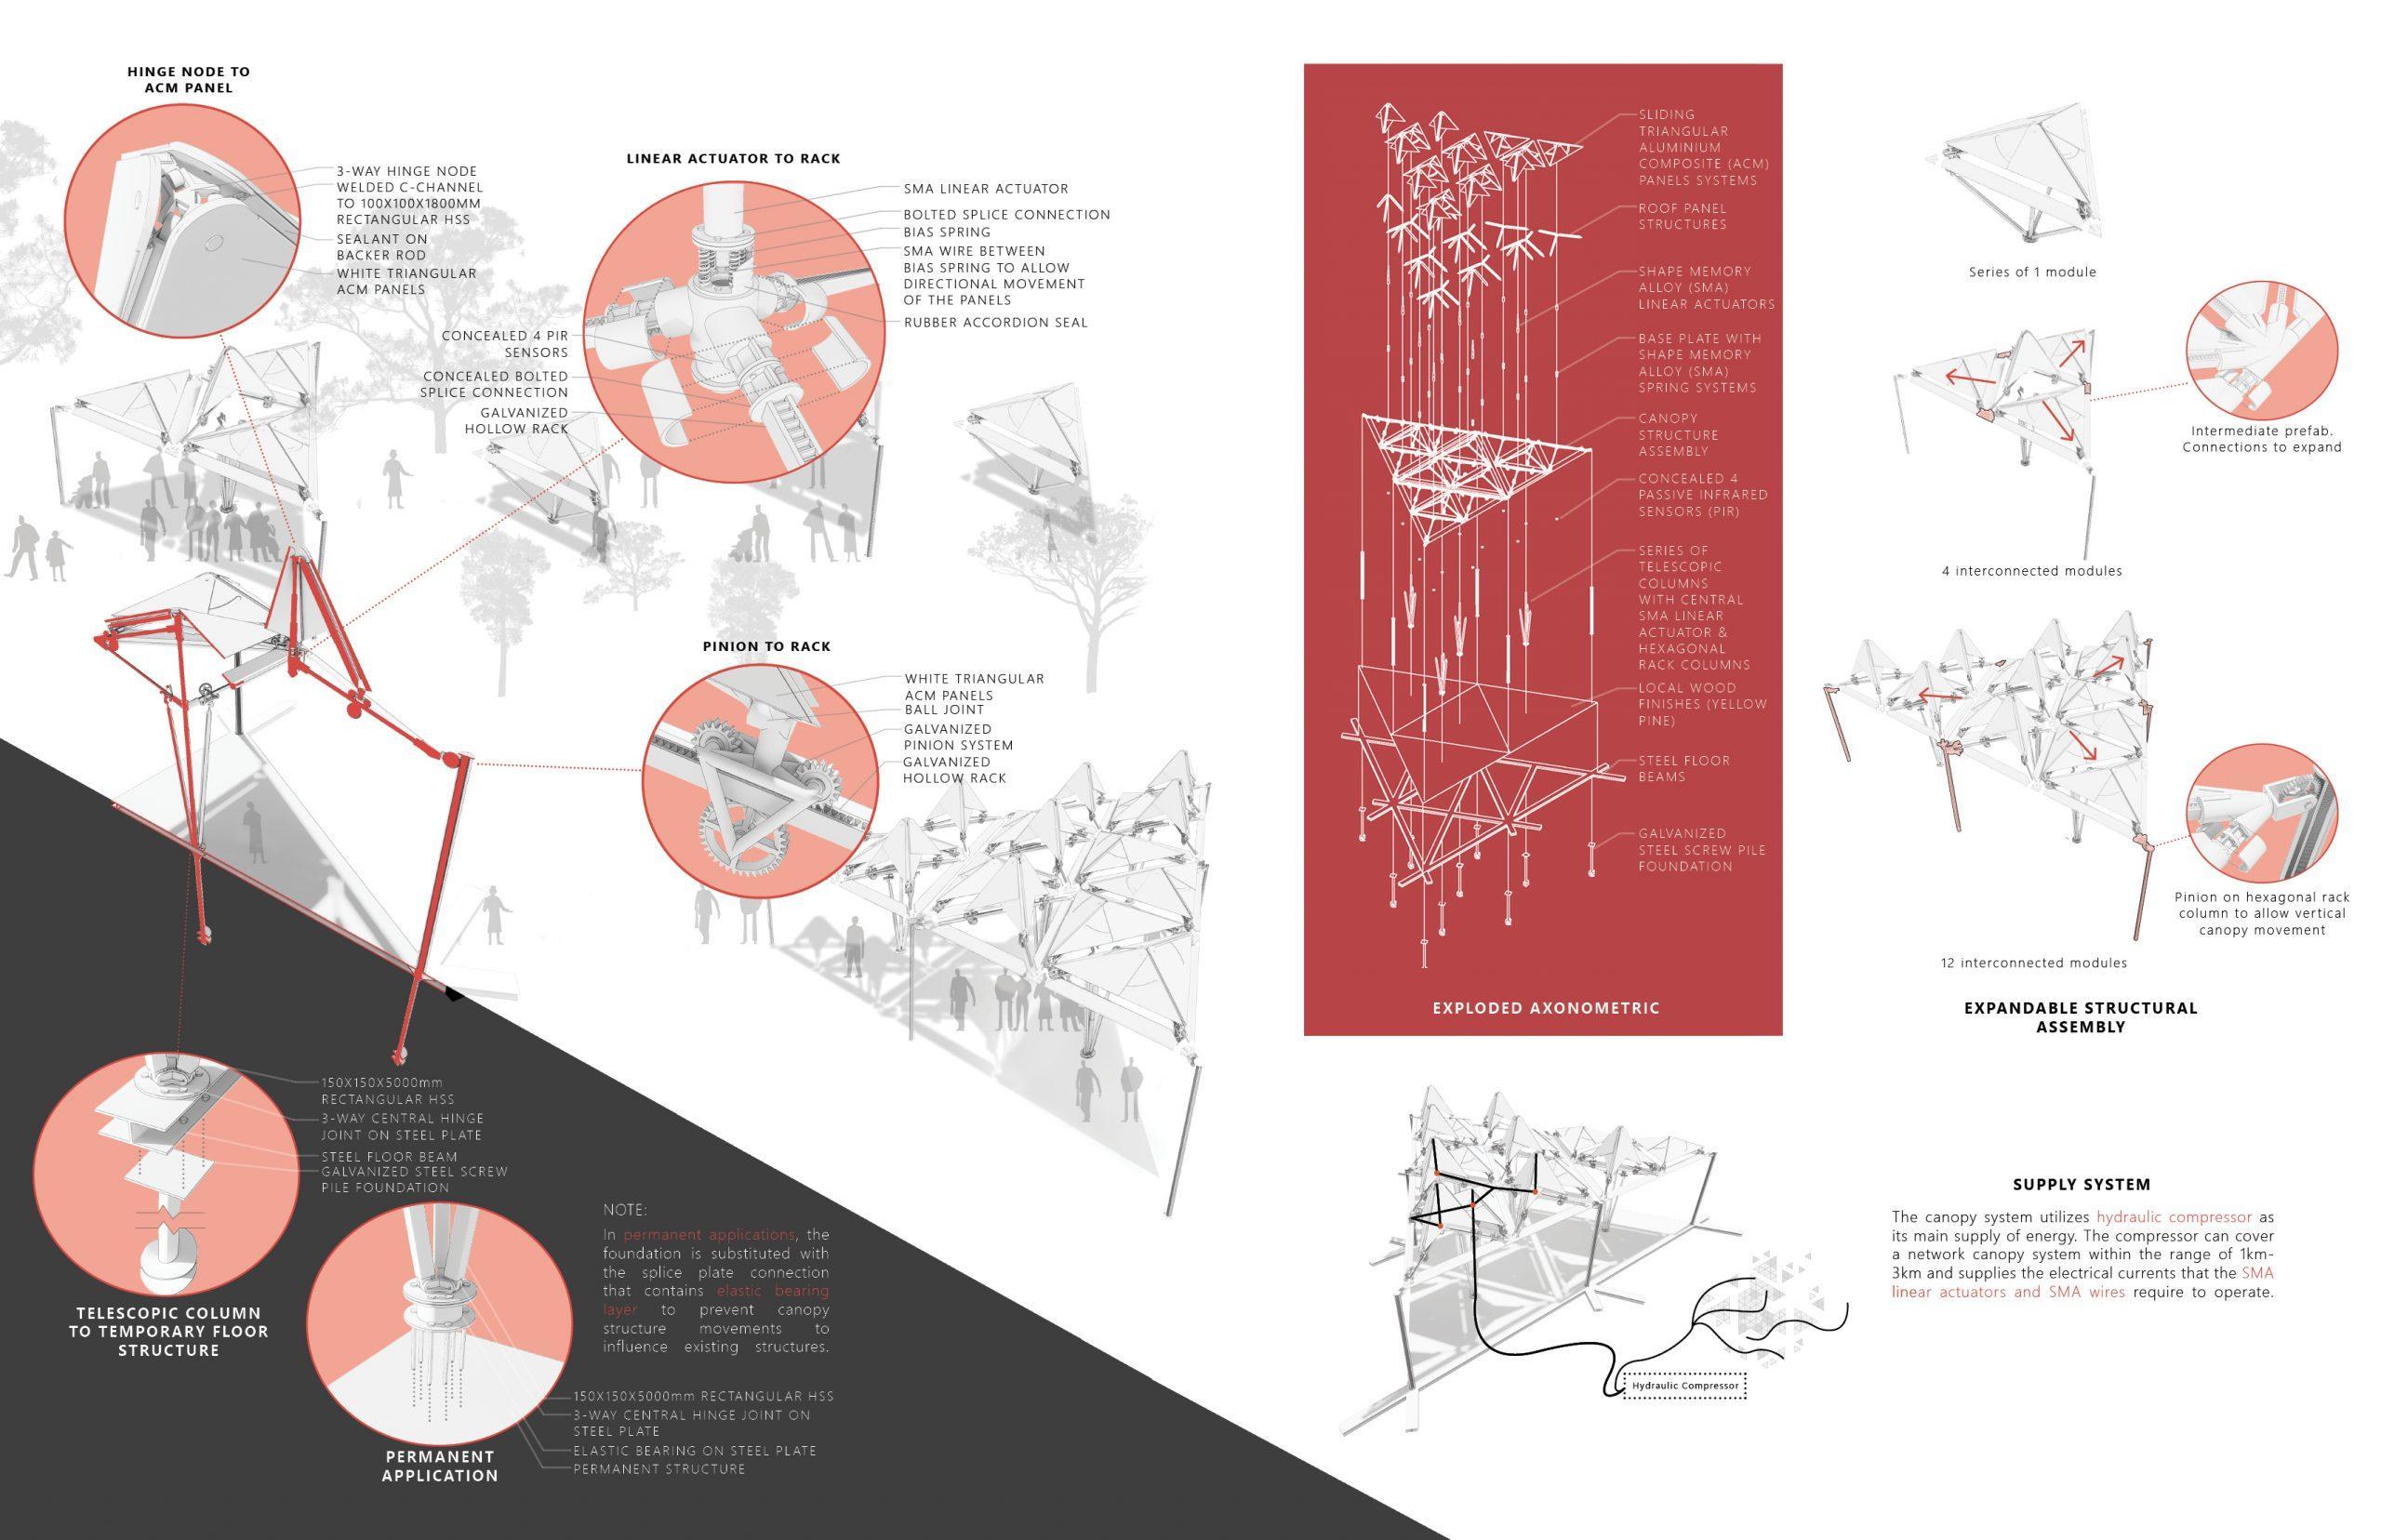 Bronze Prize In Responsive Design Acclimate 03